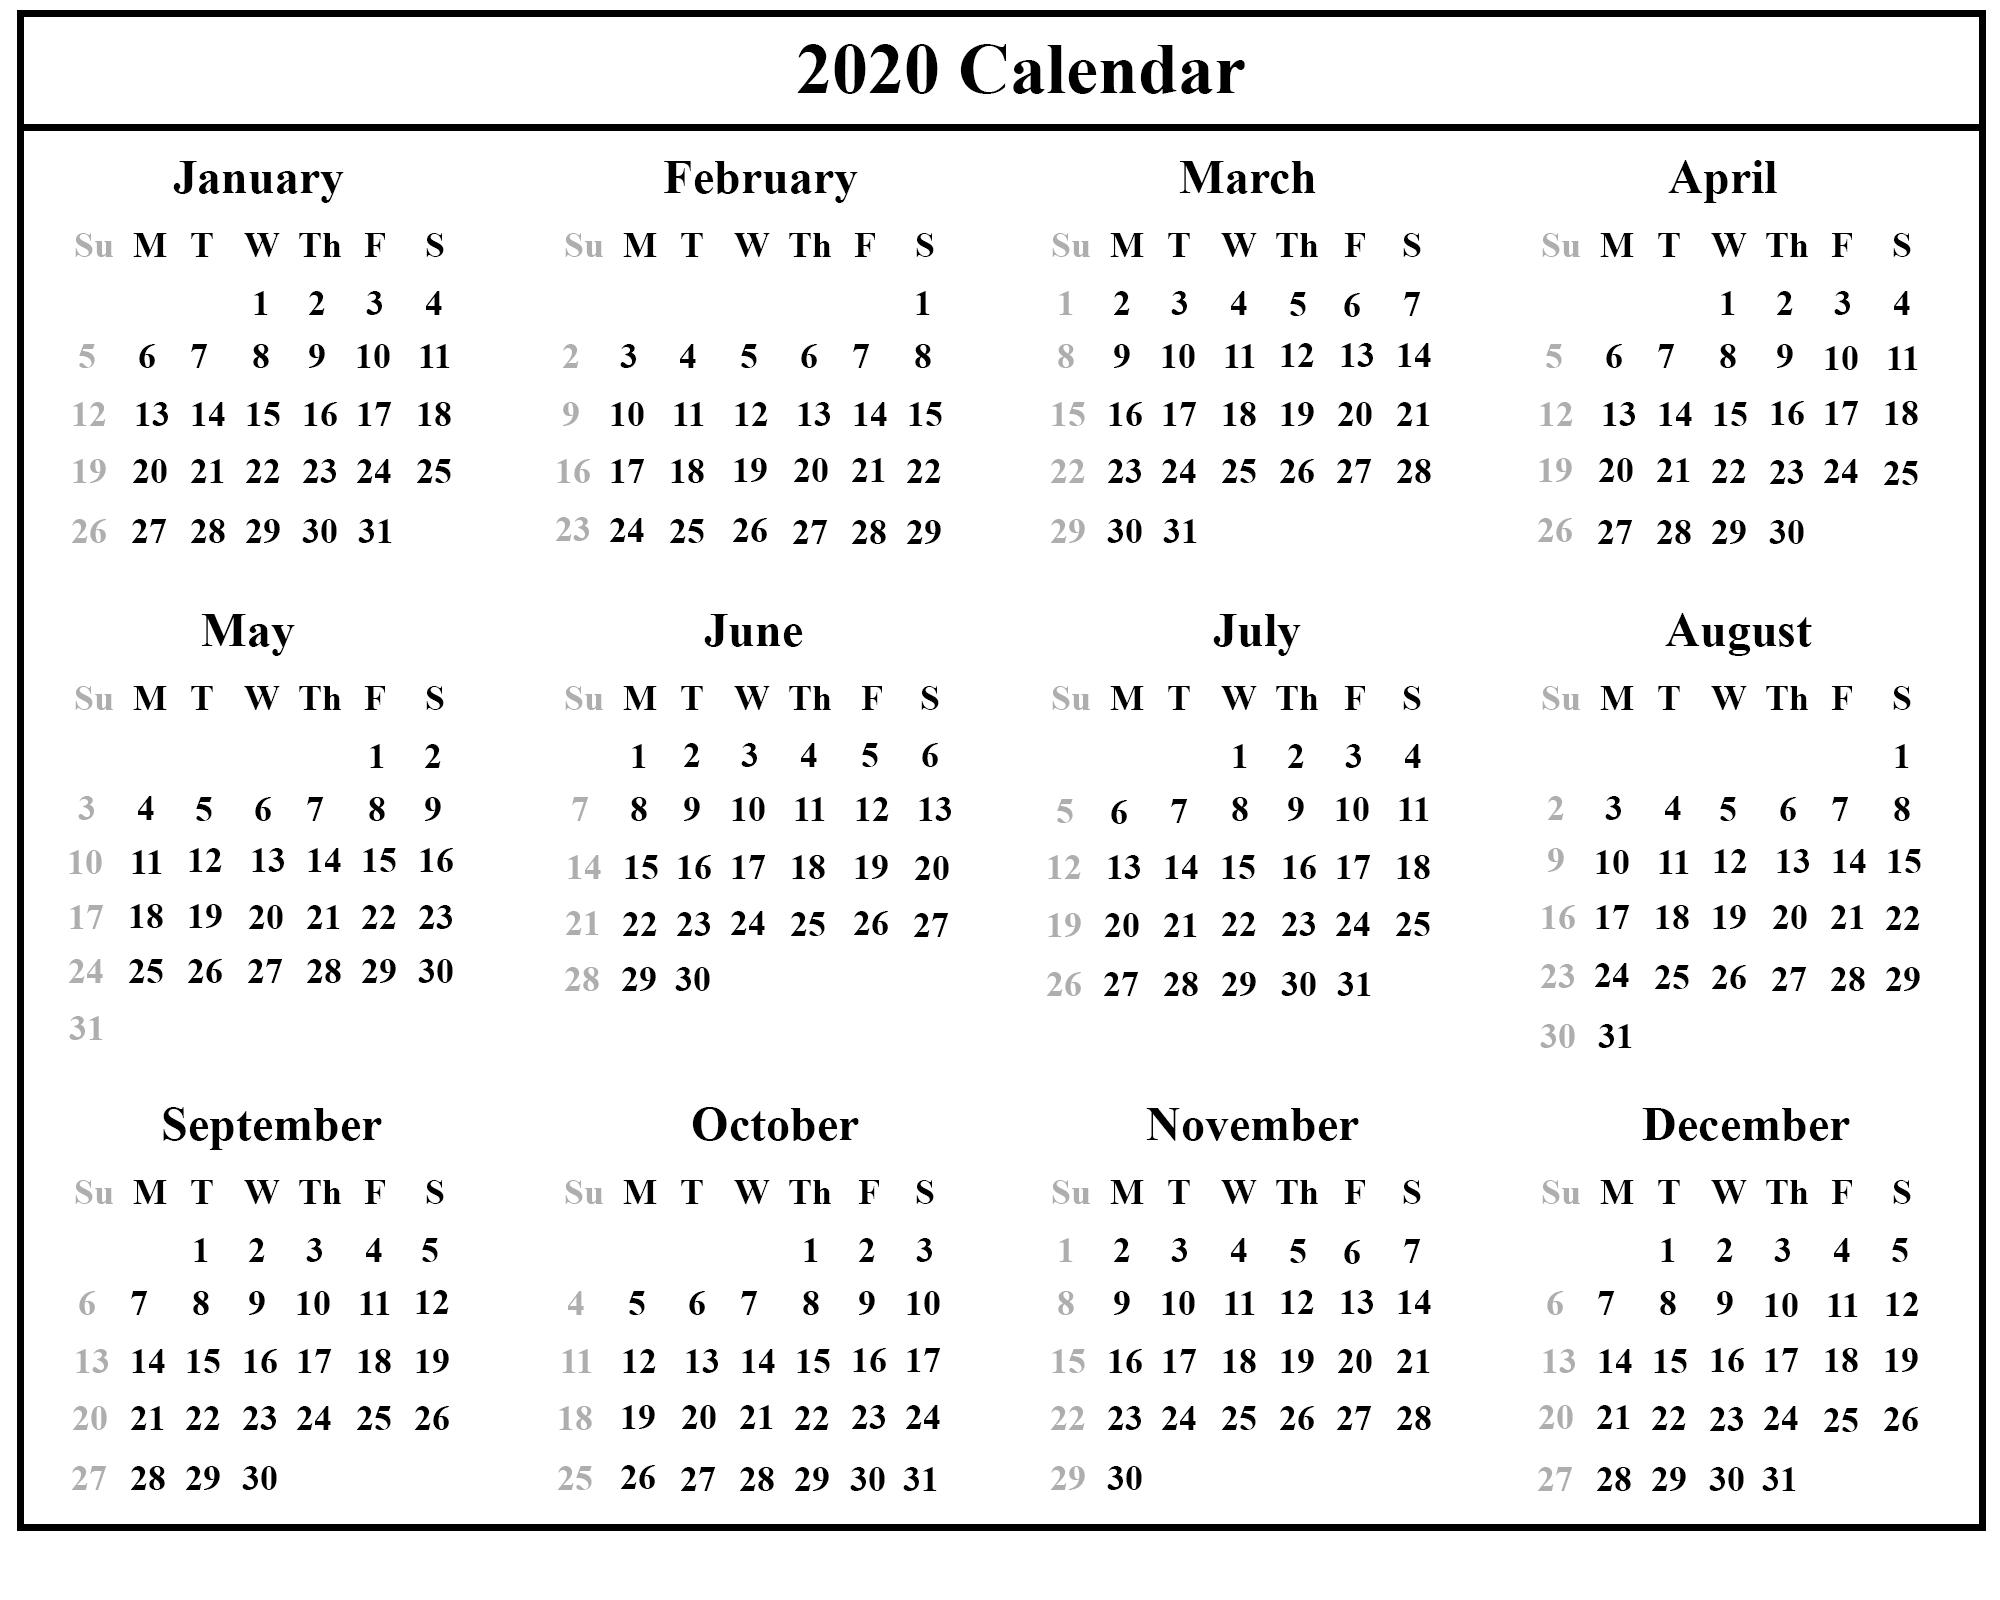 2020 Calendar Printable Nsw | Monthly Printable Calender Nsw Calendar 2020 Free Printable